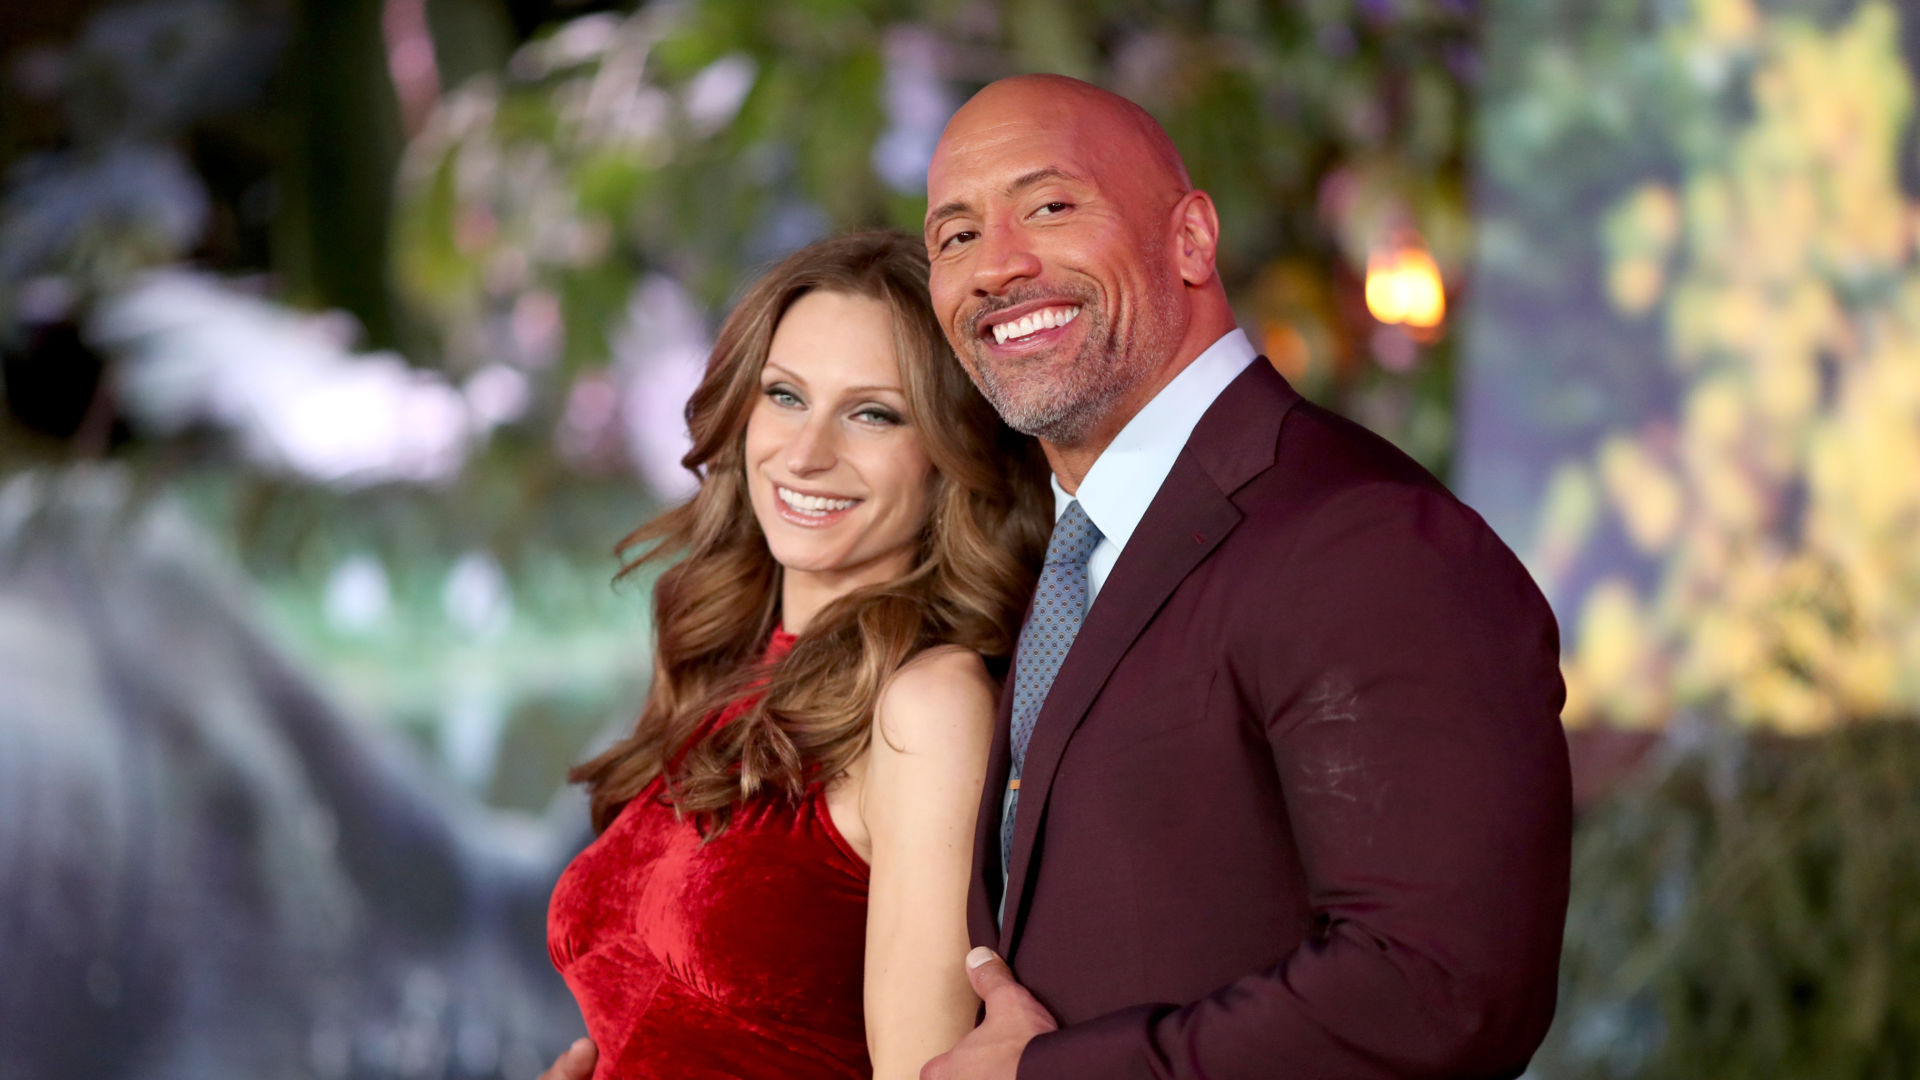 dwayne johnson and his wife Lauren Hashian